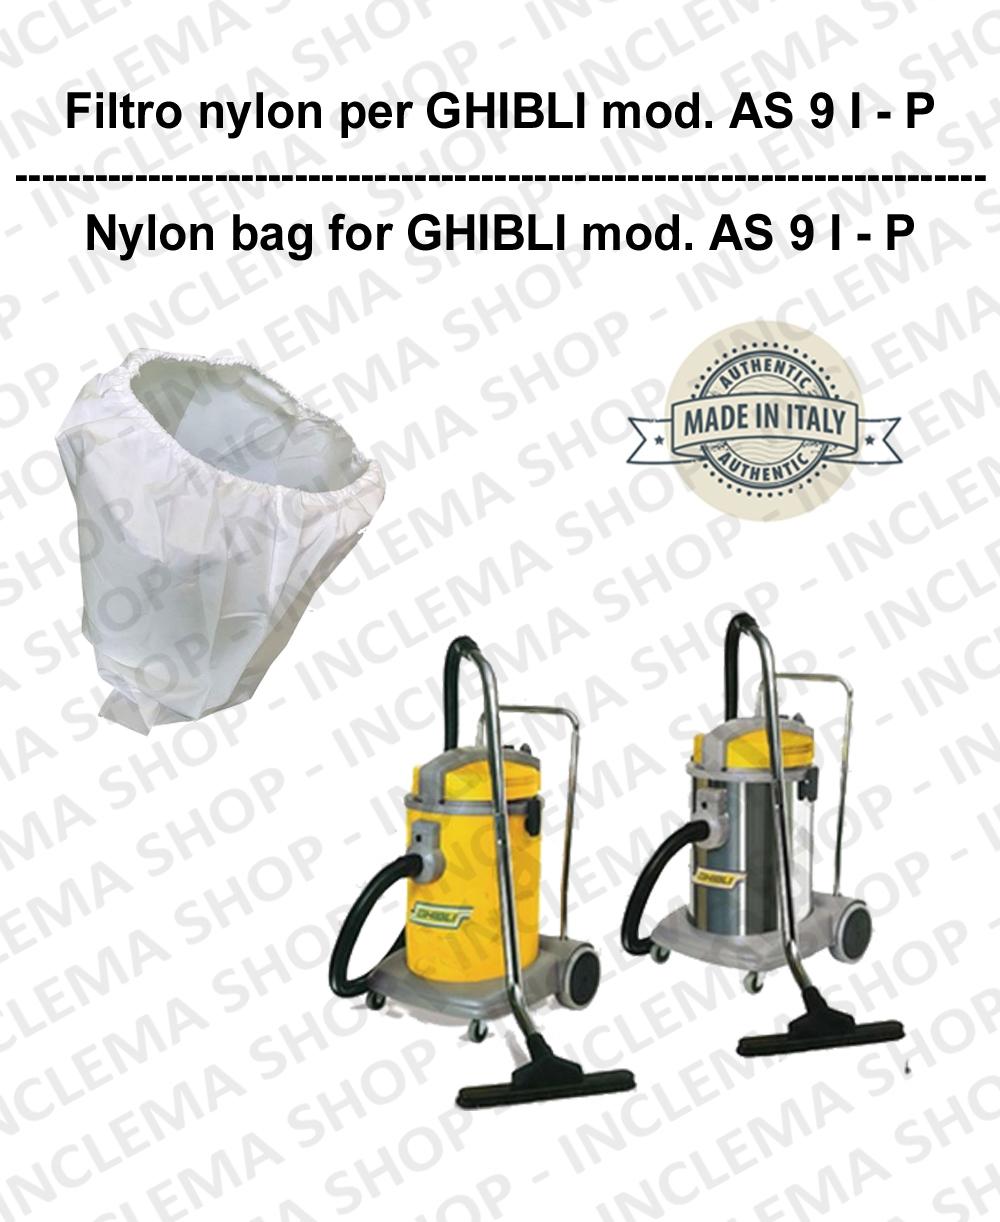 SACCO Filtro de Nylon cod: 3001215 para aspiradora GHIBLI Model AS9